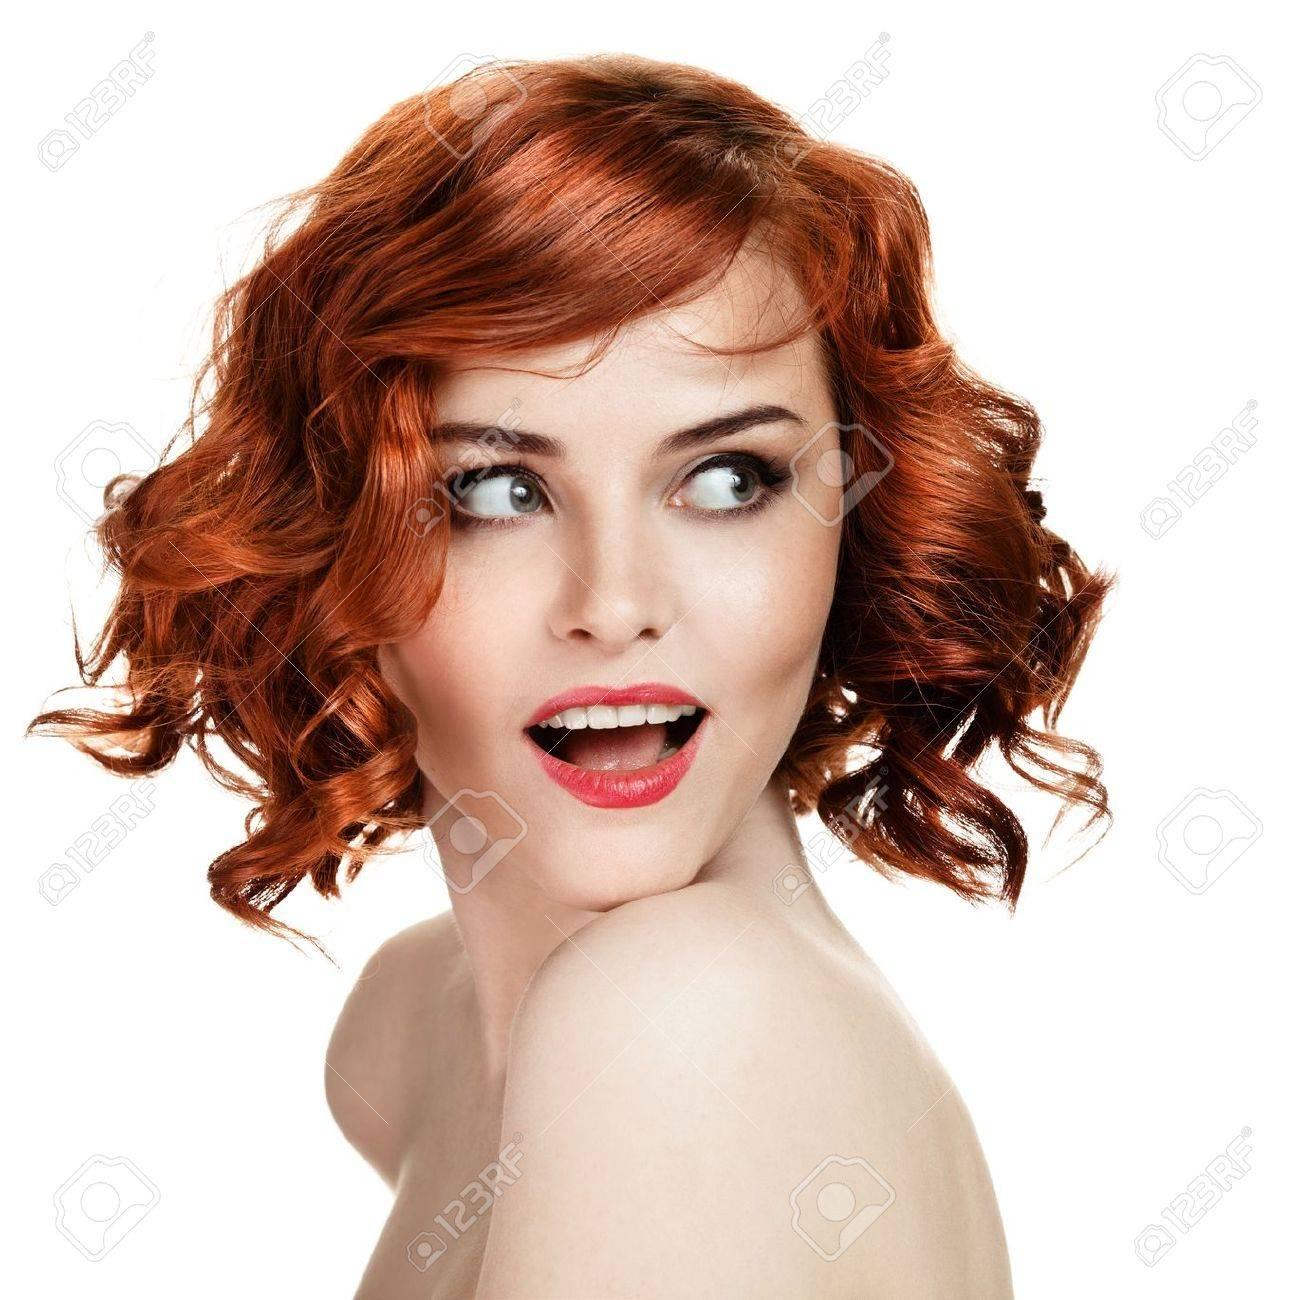 Beautiful smiling woman portrait on white background Stock Photo - 12638744